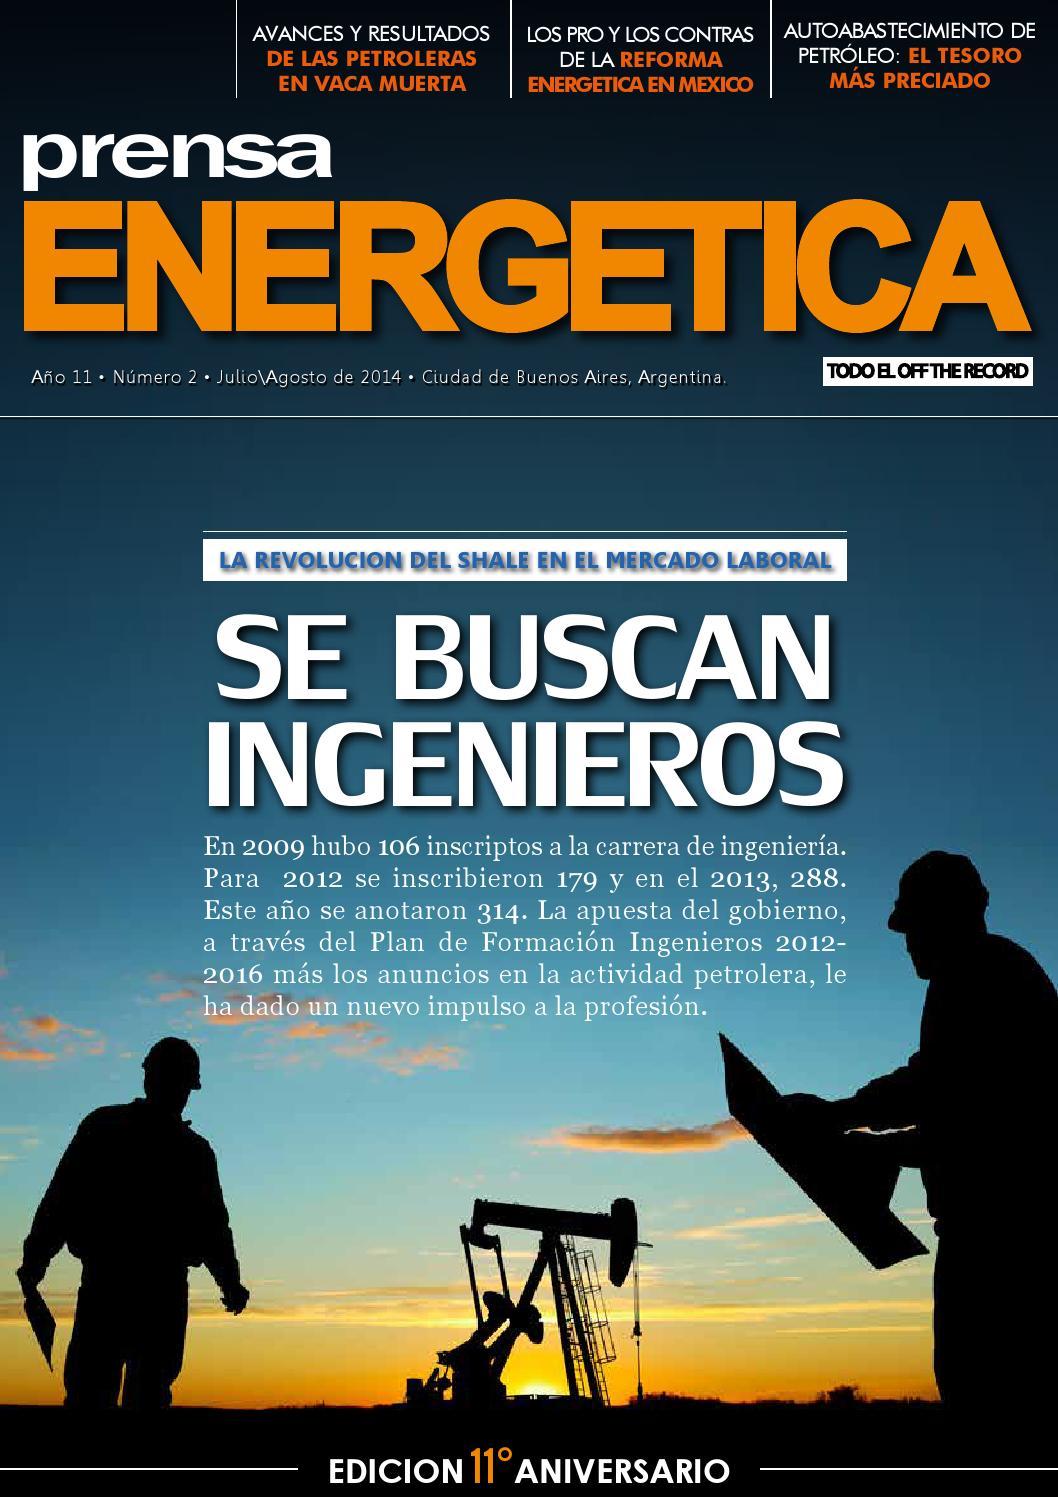 REVISTA PRENSA ENERGETICA JULIO / AGOSTO 2004 by gsalip gaston - issuu